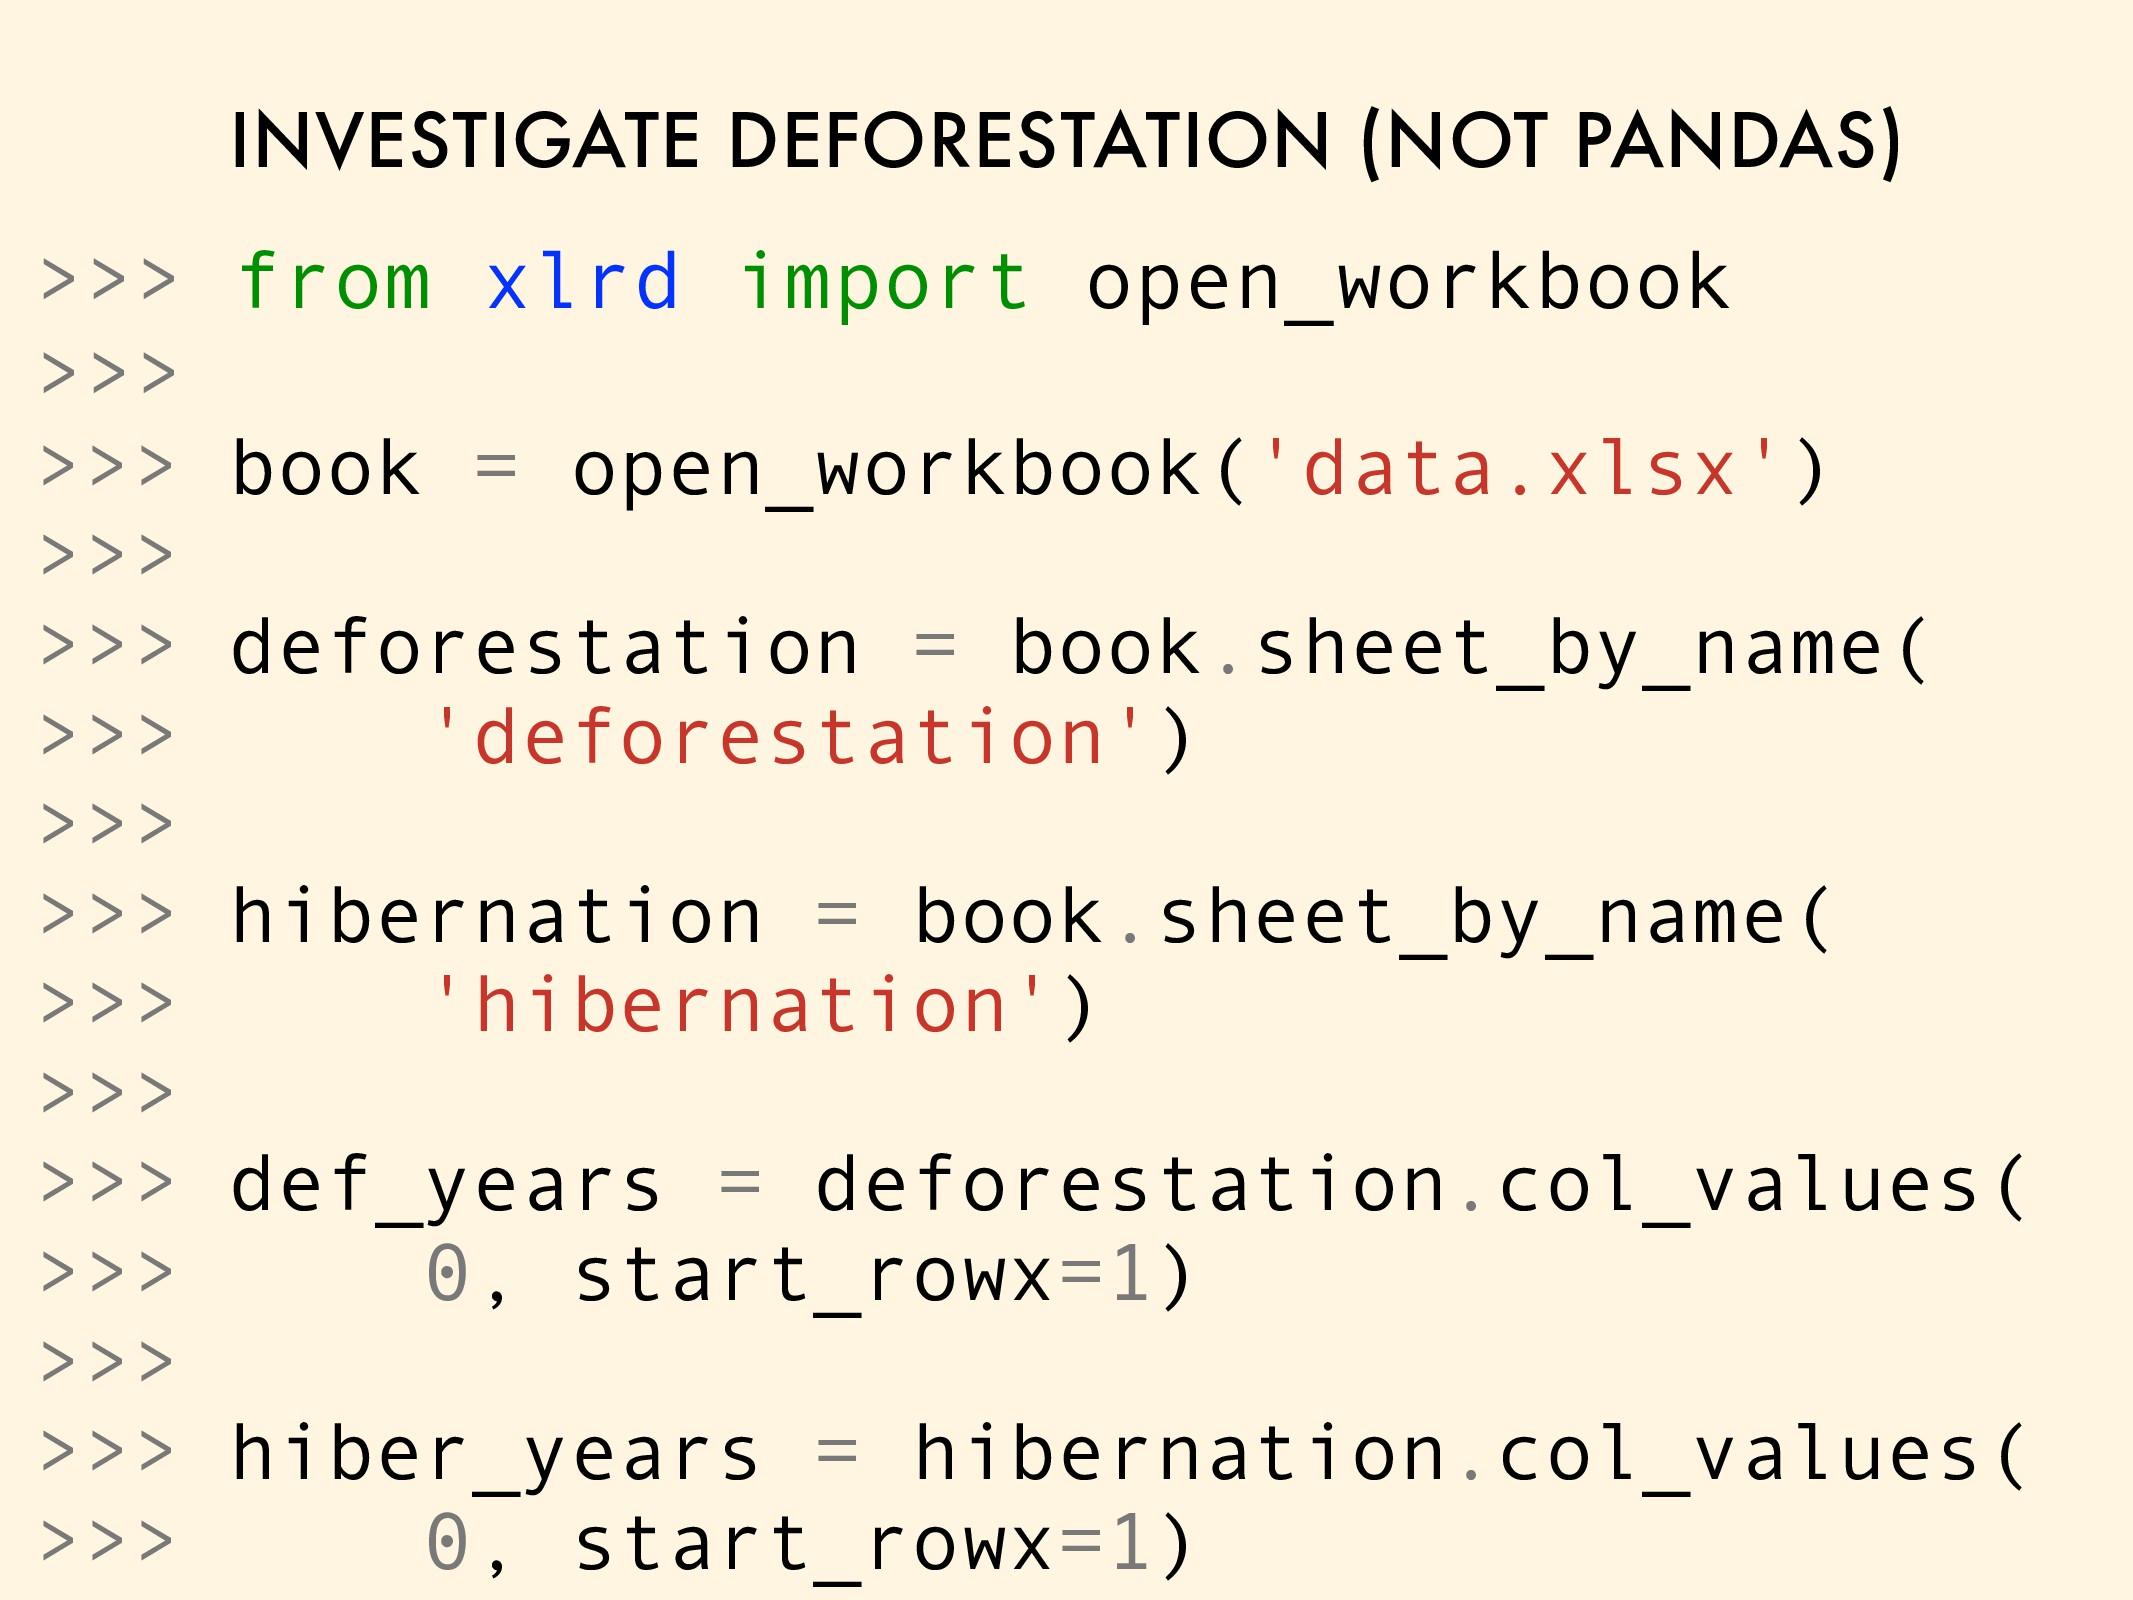 INVESTIGATE DEFORESTATION (NOT PANDAS) >>> from...